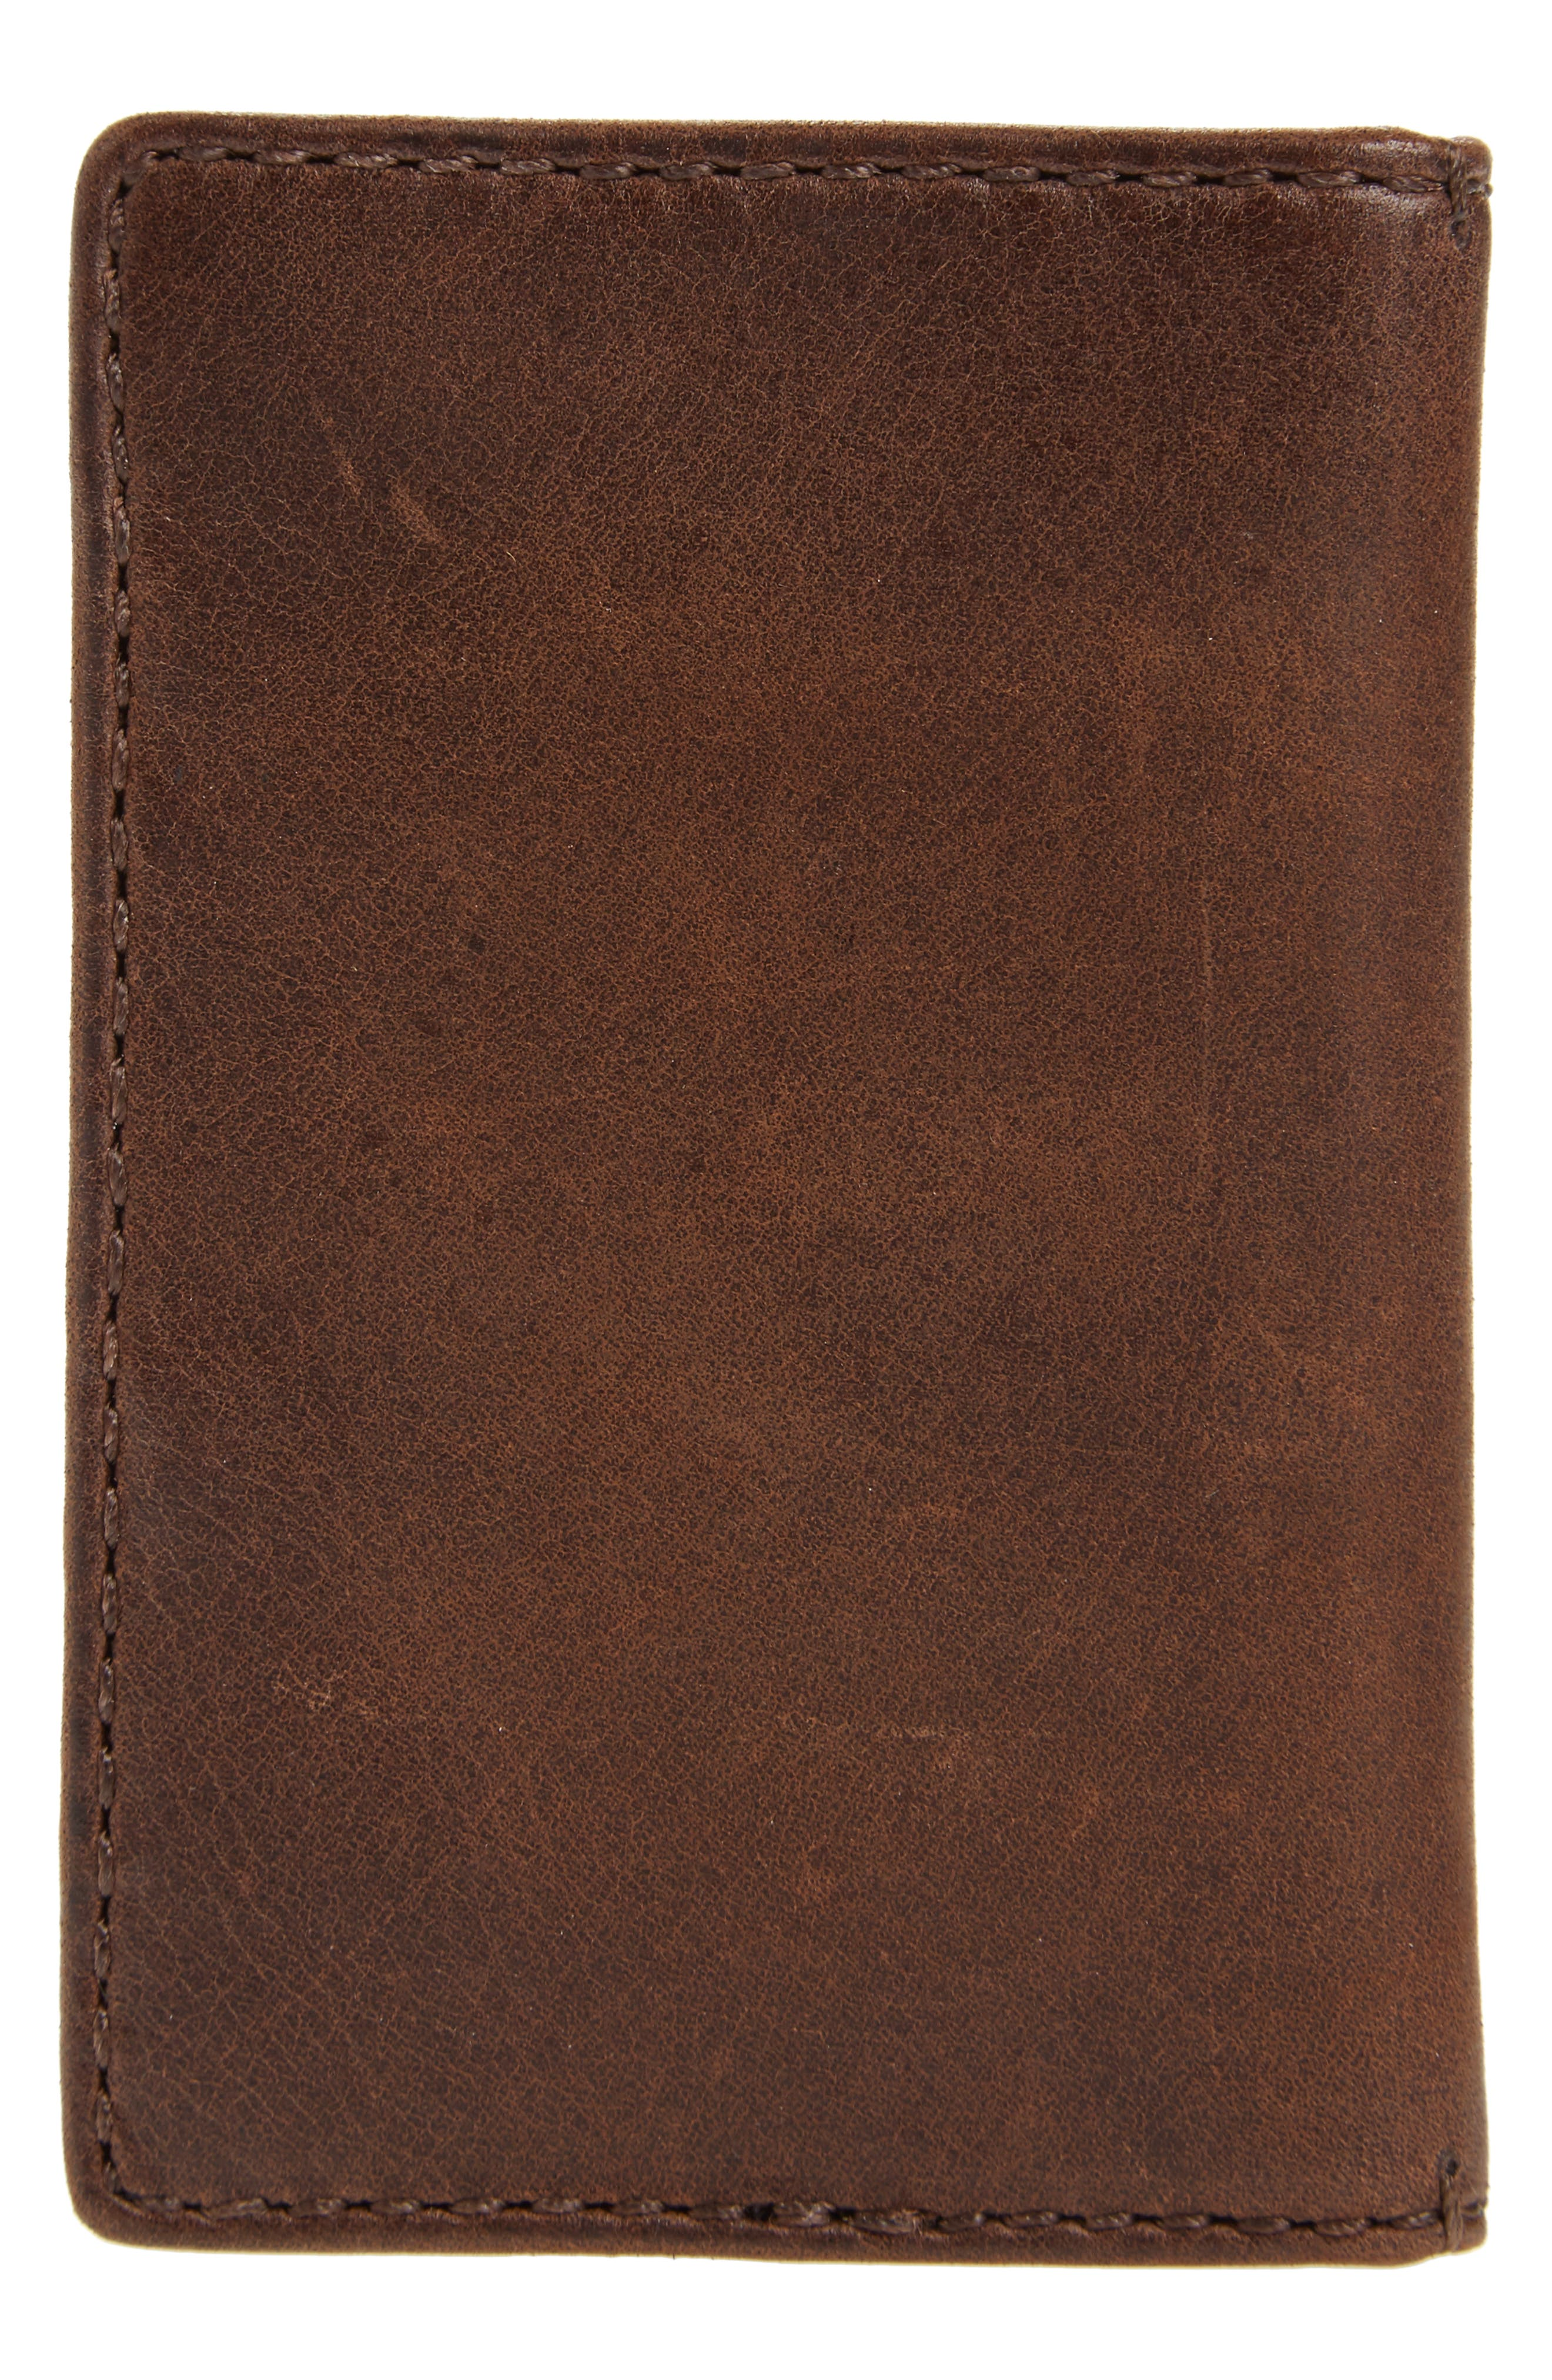 Oliver Leather Wallet,                             Alternate thumbnail 3, color,                             Dark Brown